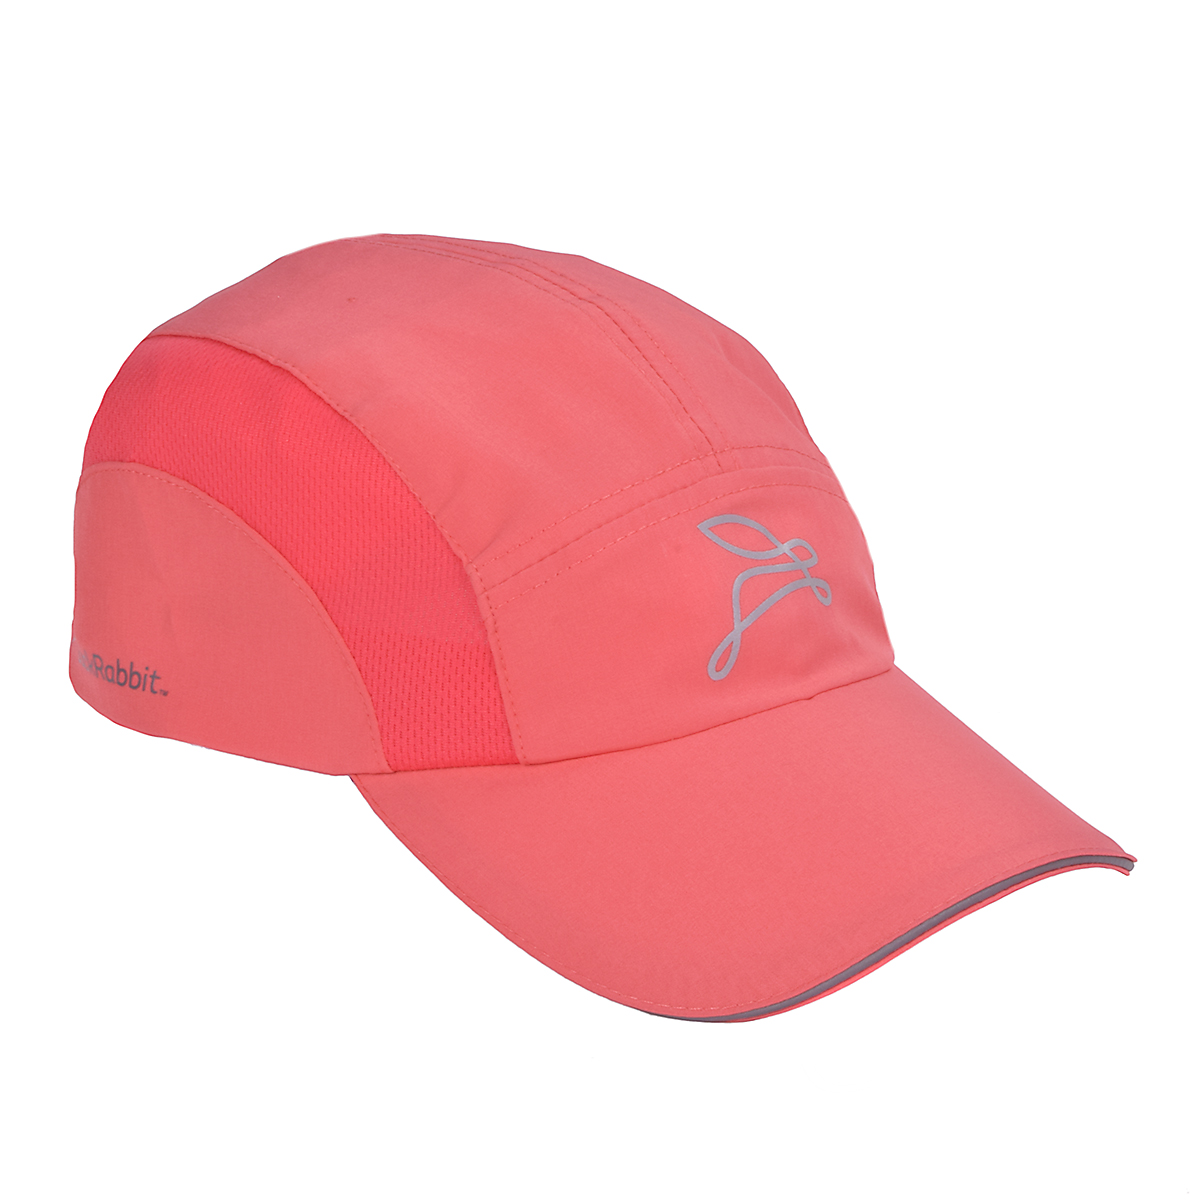 JackRabbit Run Hat - Color: Coral - Size: One Size, Coral, large, image 1